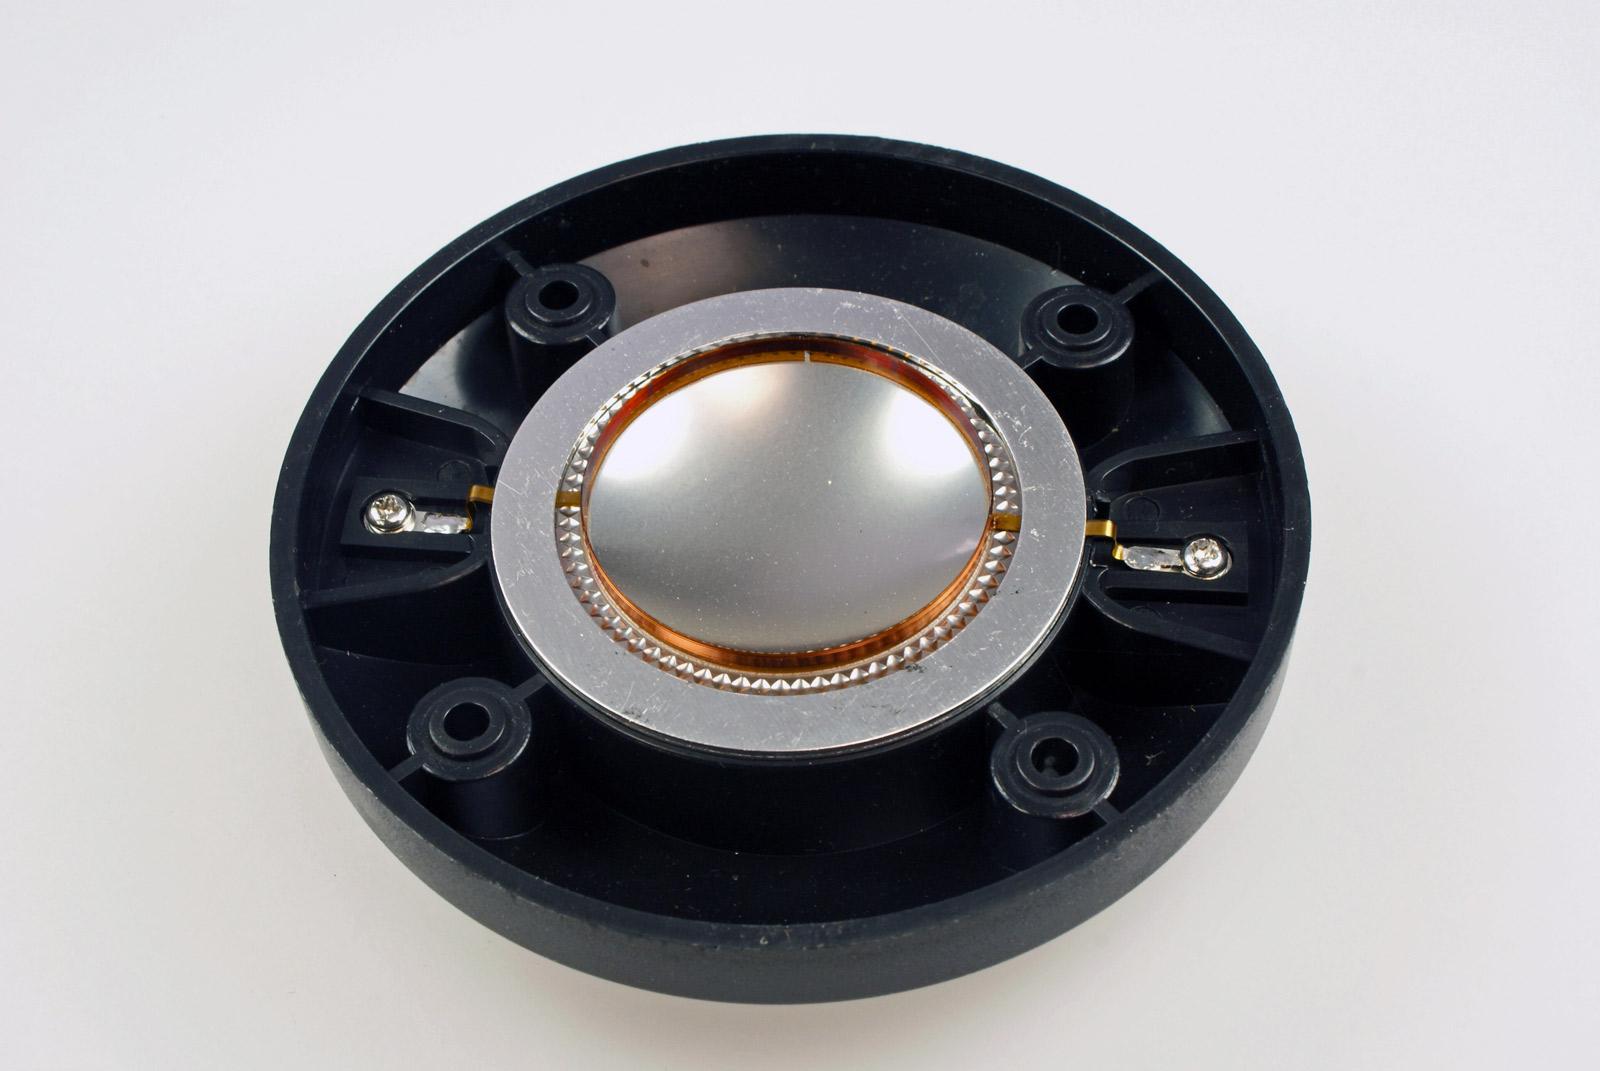 Ersatzdiaphragma-fuer-Kenford-COMP-44A-8-Ohm-Ersatzschwingspule-Diaphragma